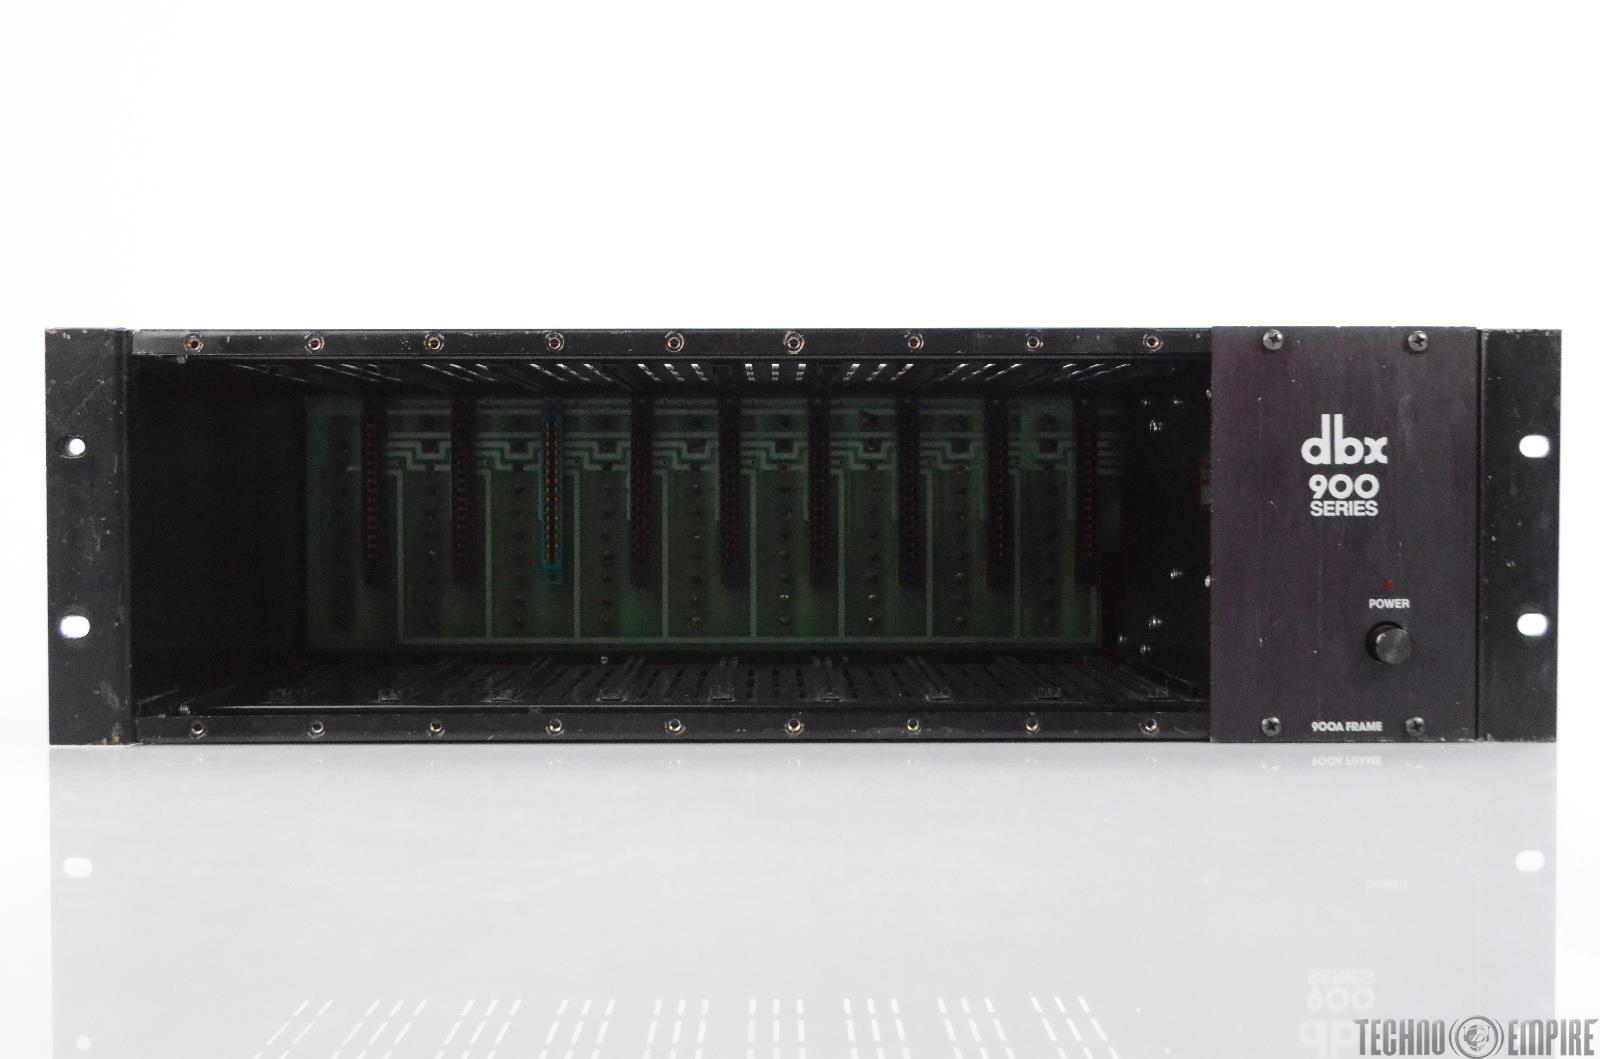 DBX F-900A Frame & Power Supply 900 Series w/ Jensen Sunset Sound Factory #30435